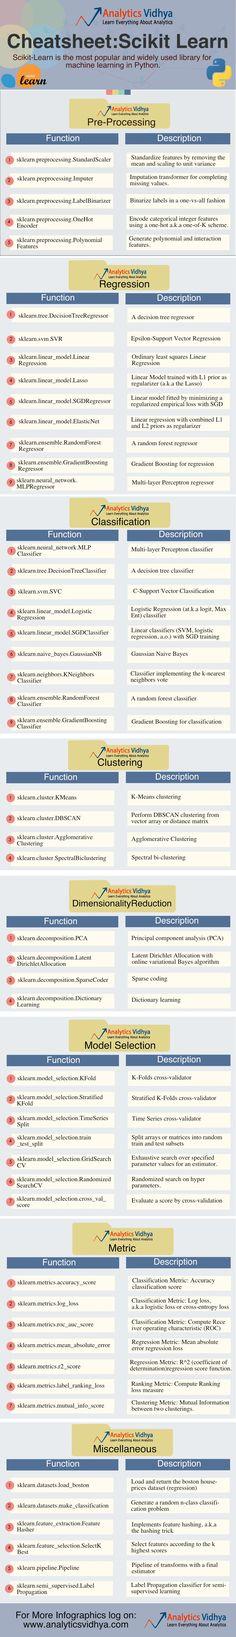 Decision Trees, Classification & Interpretation Using ...